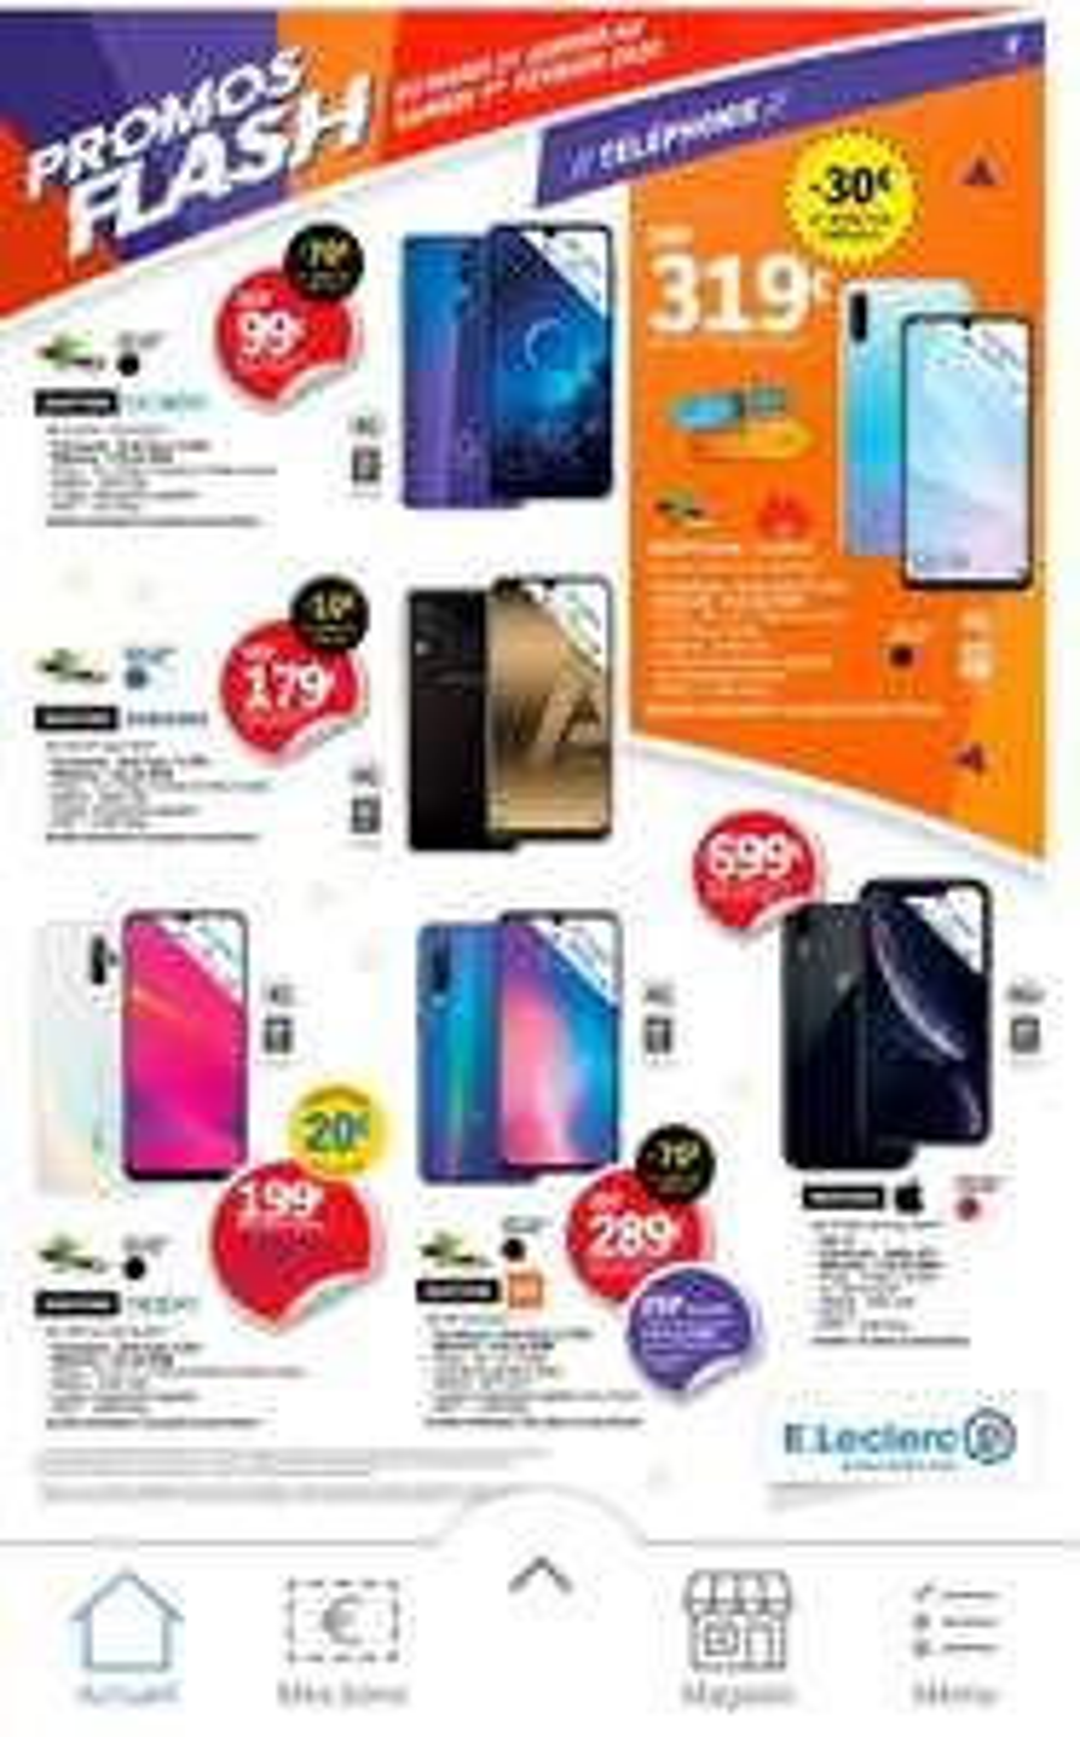 "Sélection de Smartphones en promotion - Ex: Smartphone 5.97"" Xiaomi MI 9 SE - 6 Go de Ram, 64 Go (via ODR de 30€)"